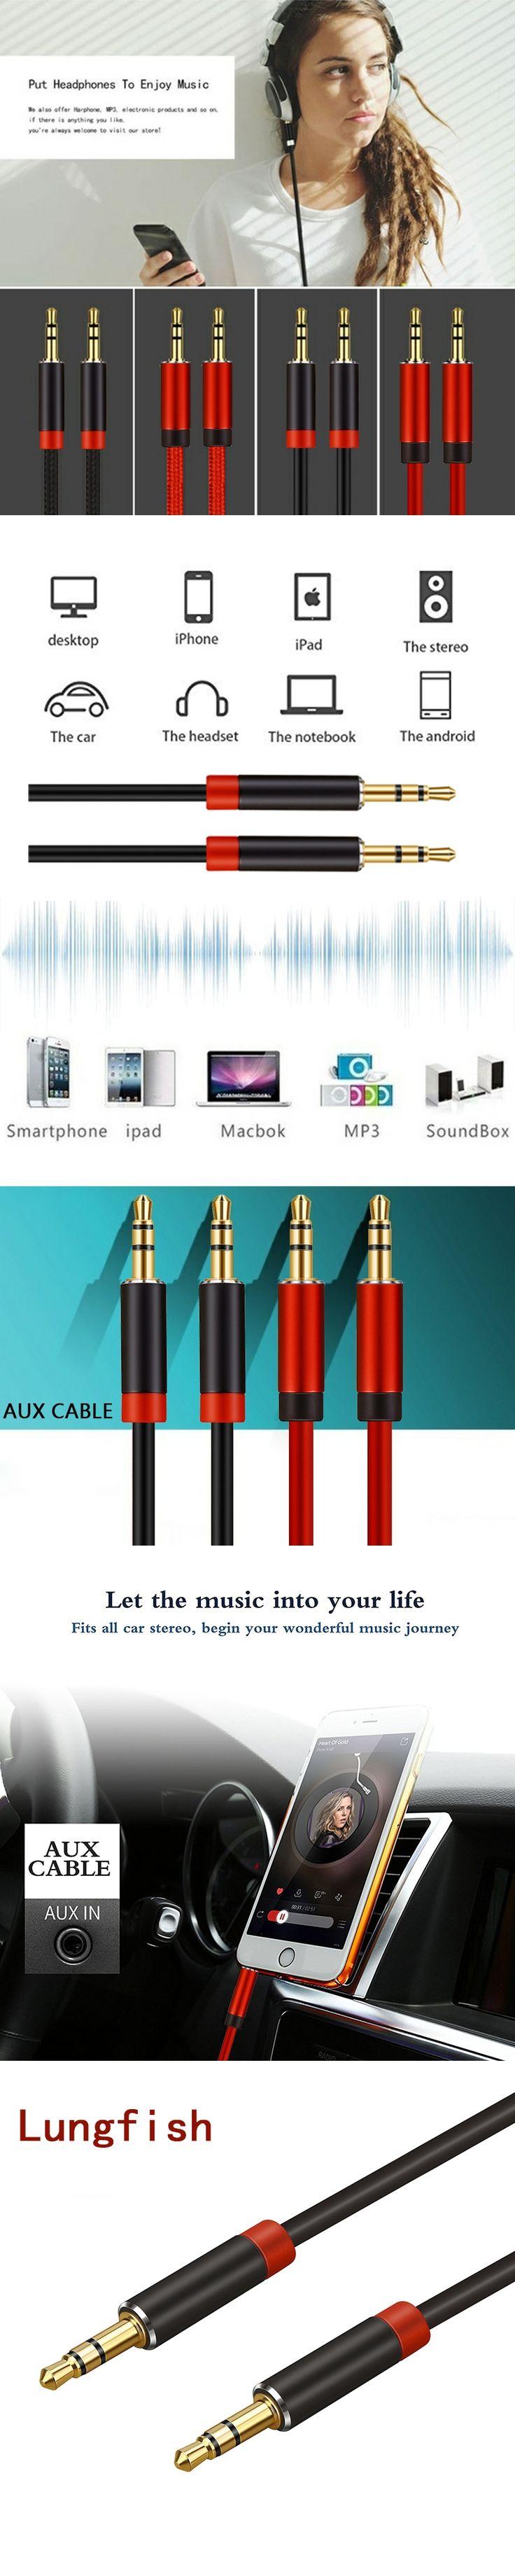 Lungfish 3.5mm audio cable jack 3.5 mm aux cable for iPhone car headphone beats speaker aux cord MP3/4 0.3m 1m 1.5m 2m 3m 5m